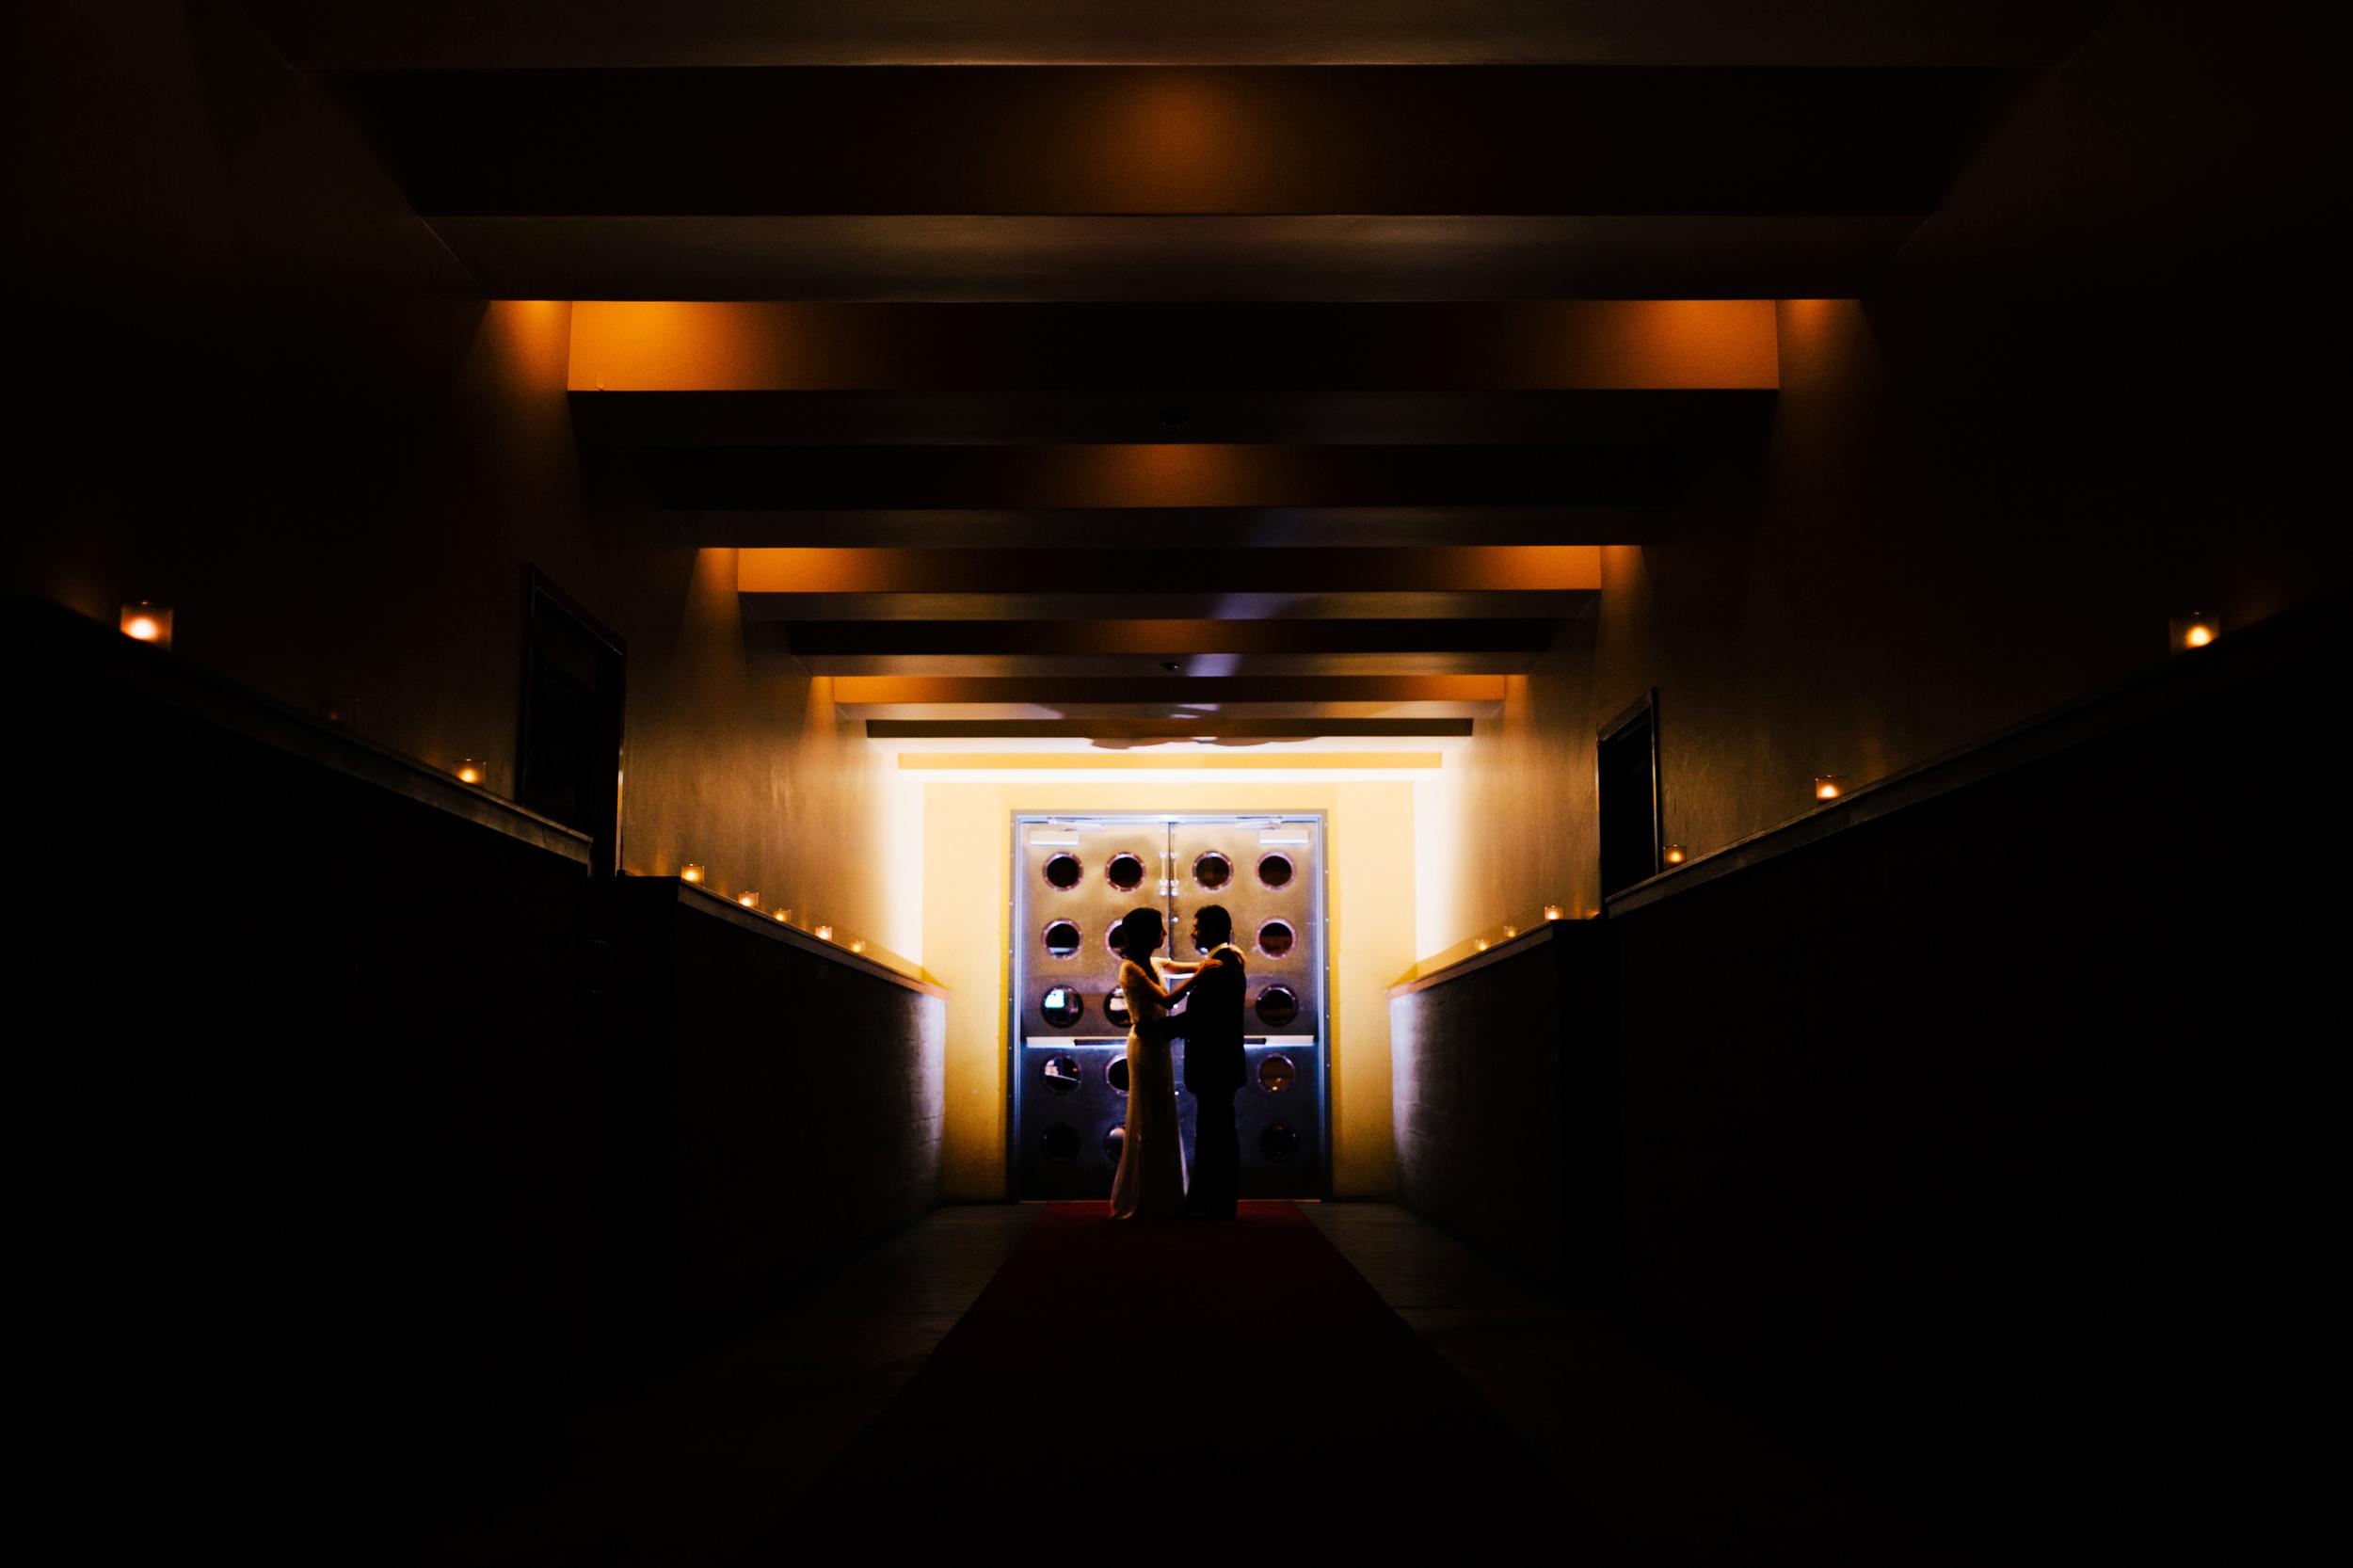 Foreign_Cinema_Wedding_Photography-24.JPG